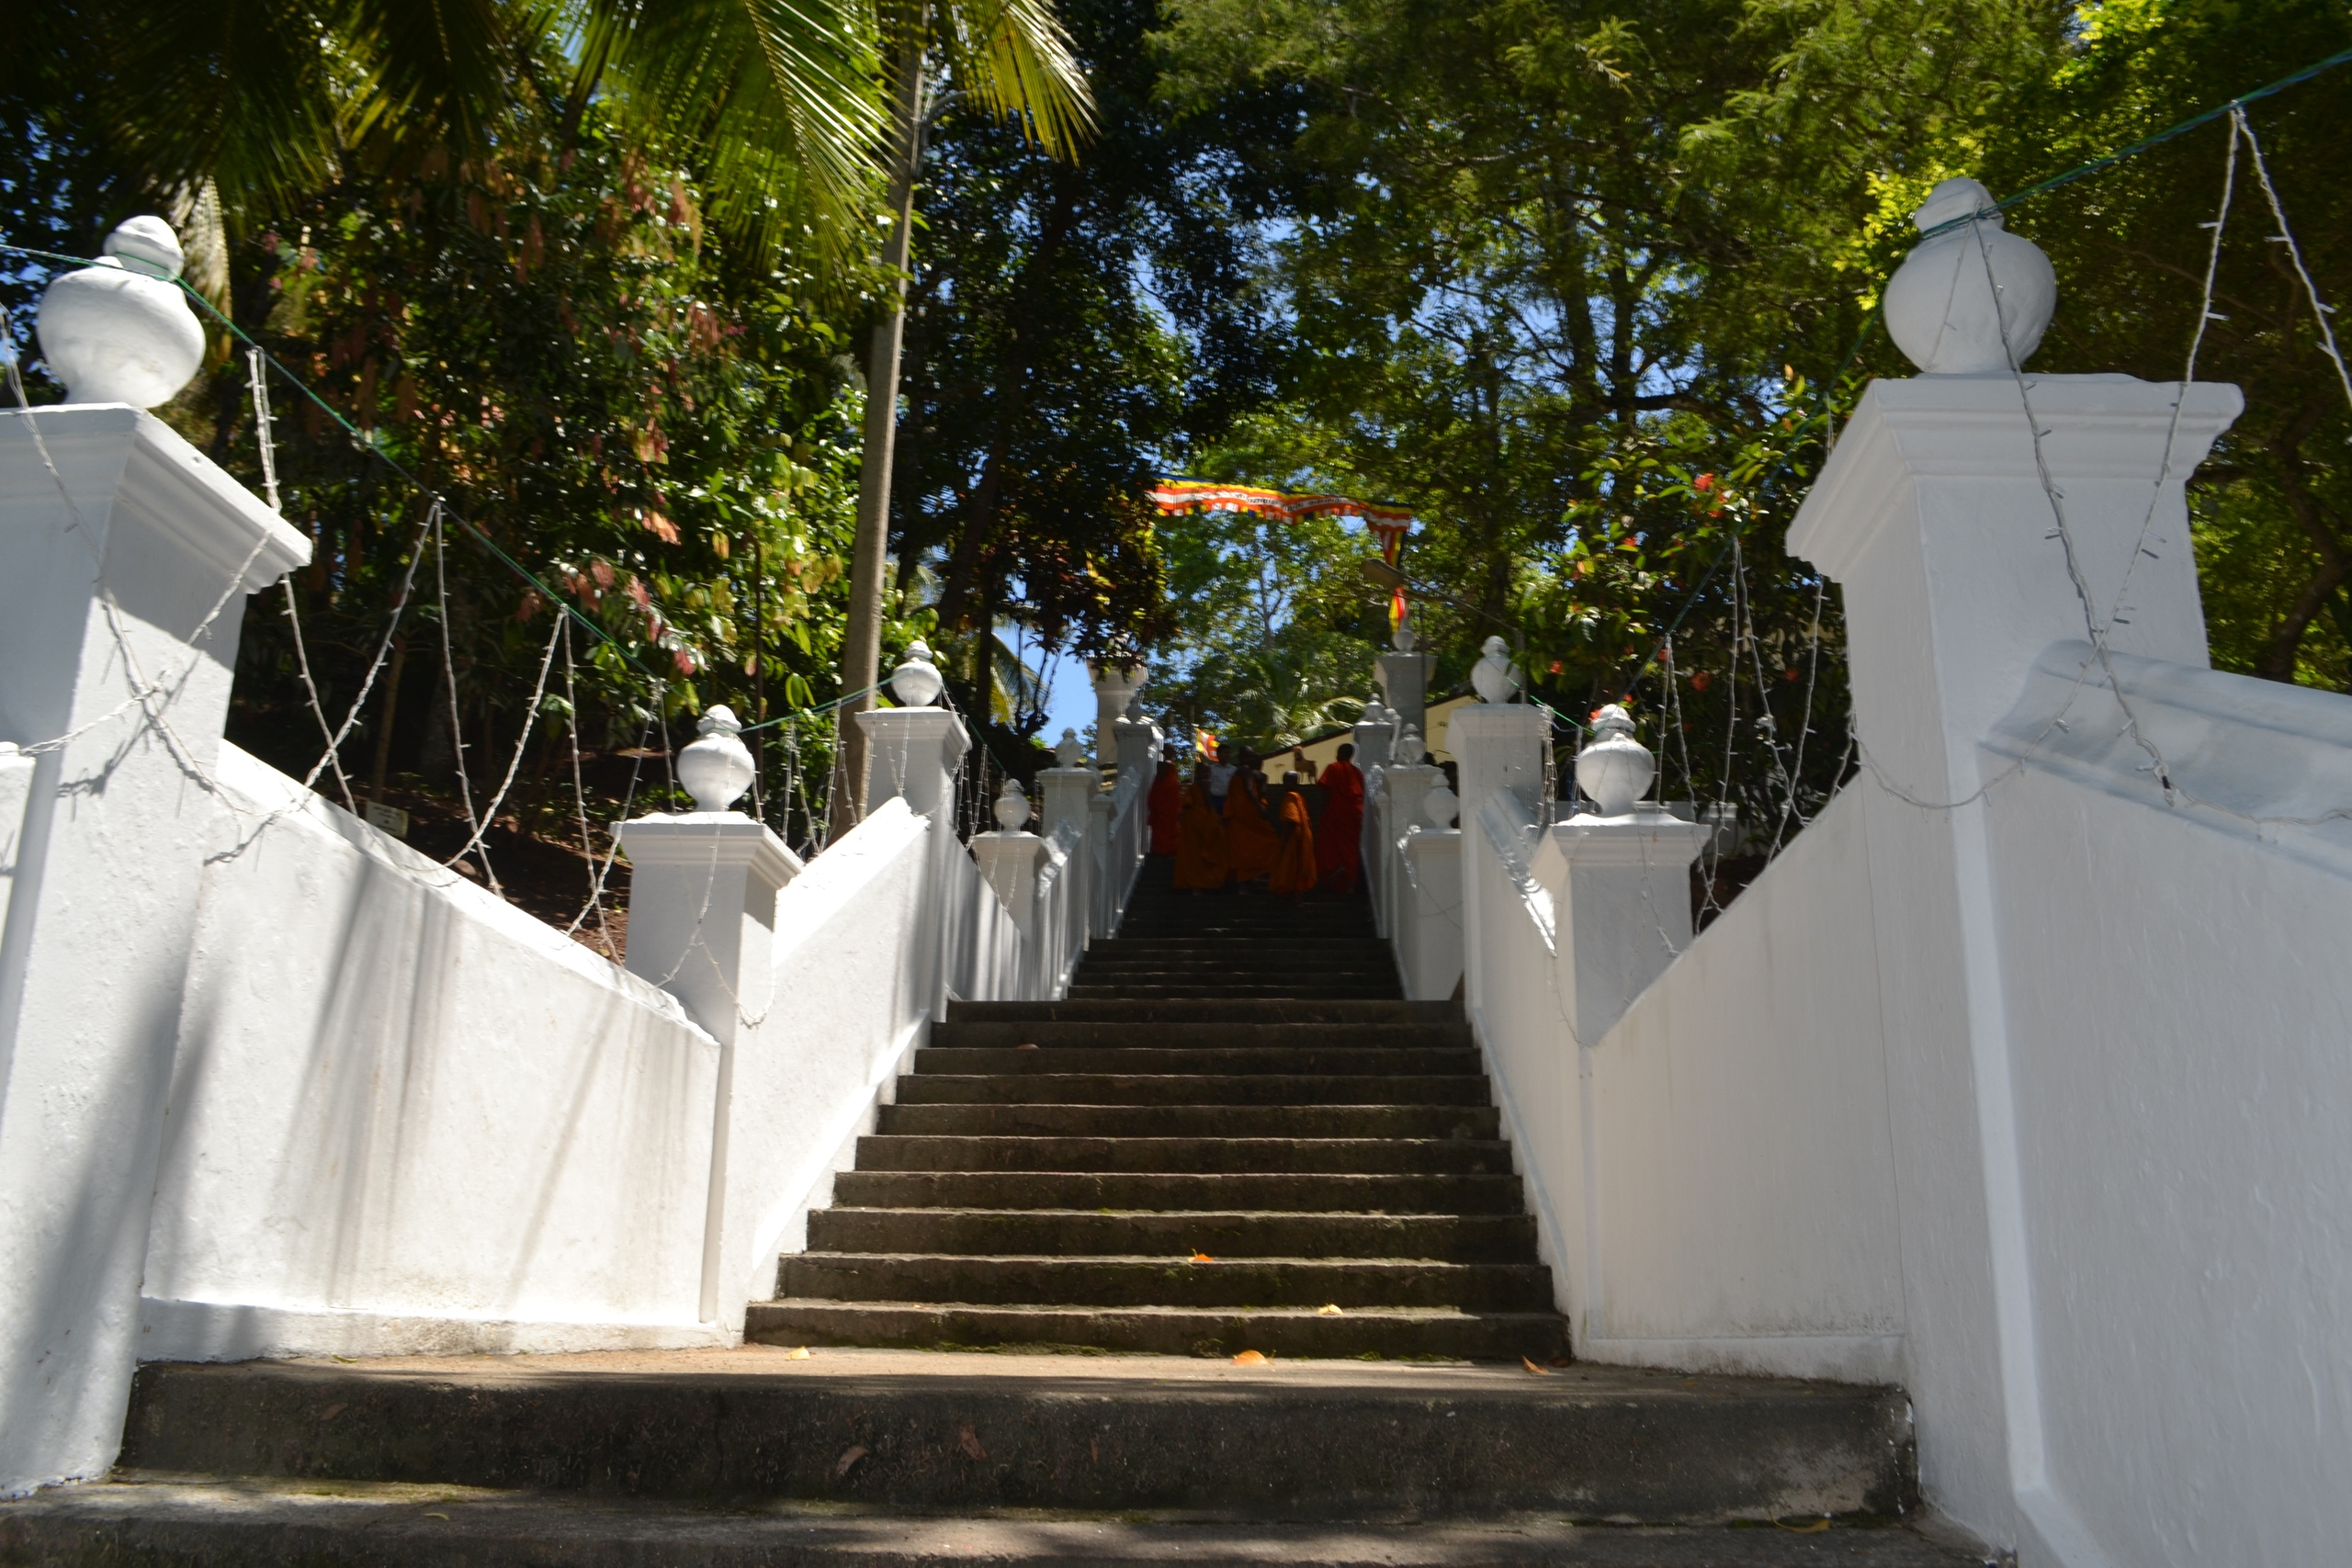 Шри Ланка (фото) - Страница 2 DL2q2zWbxuI